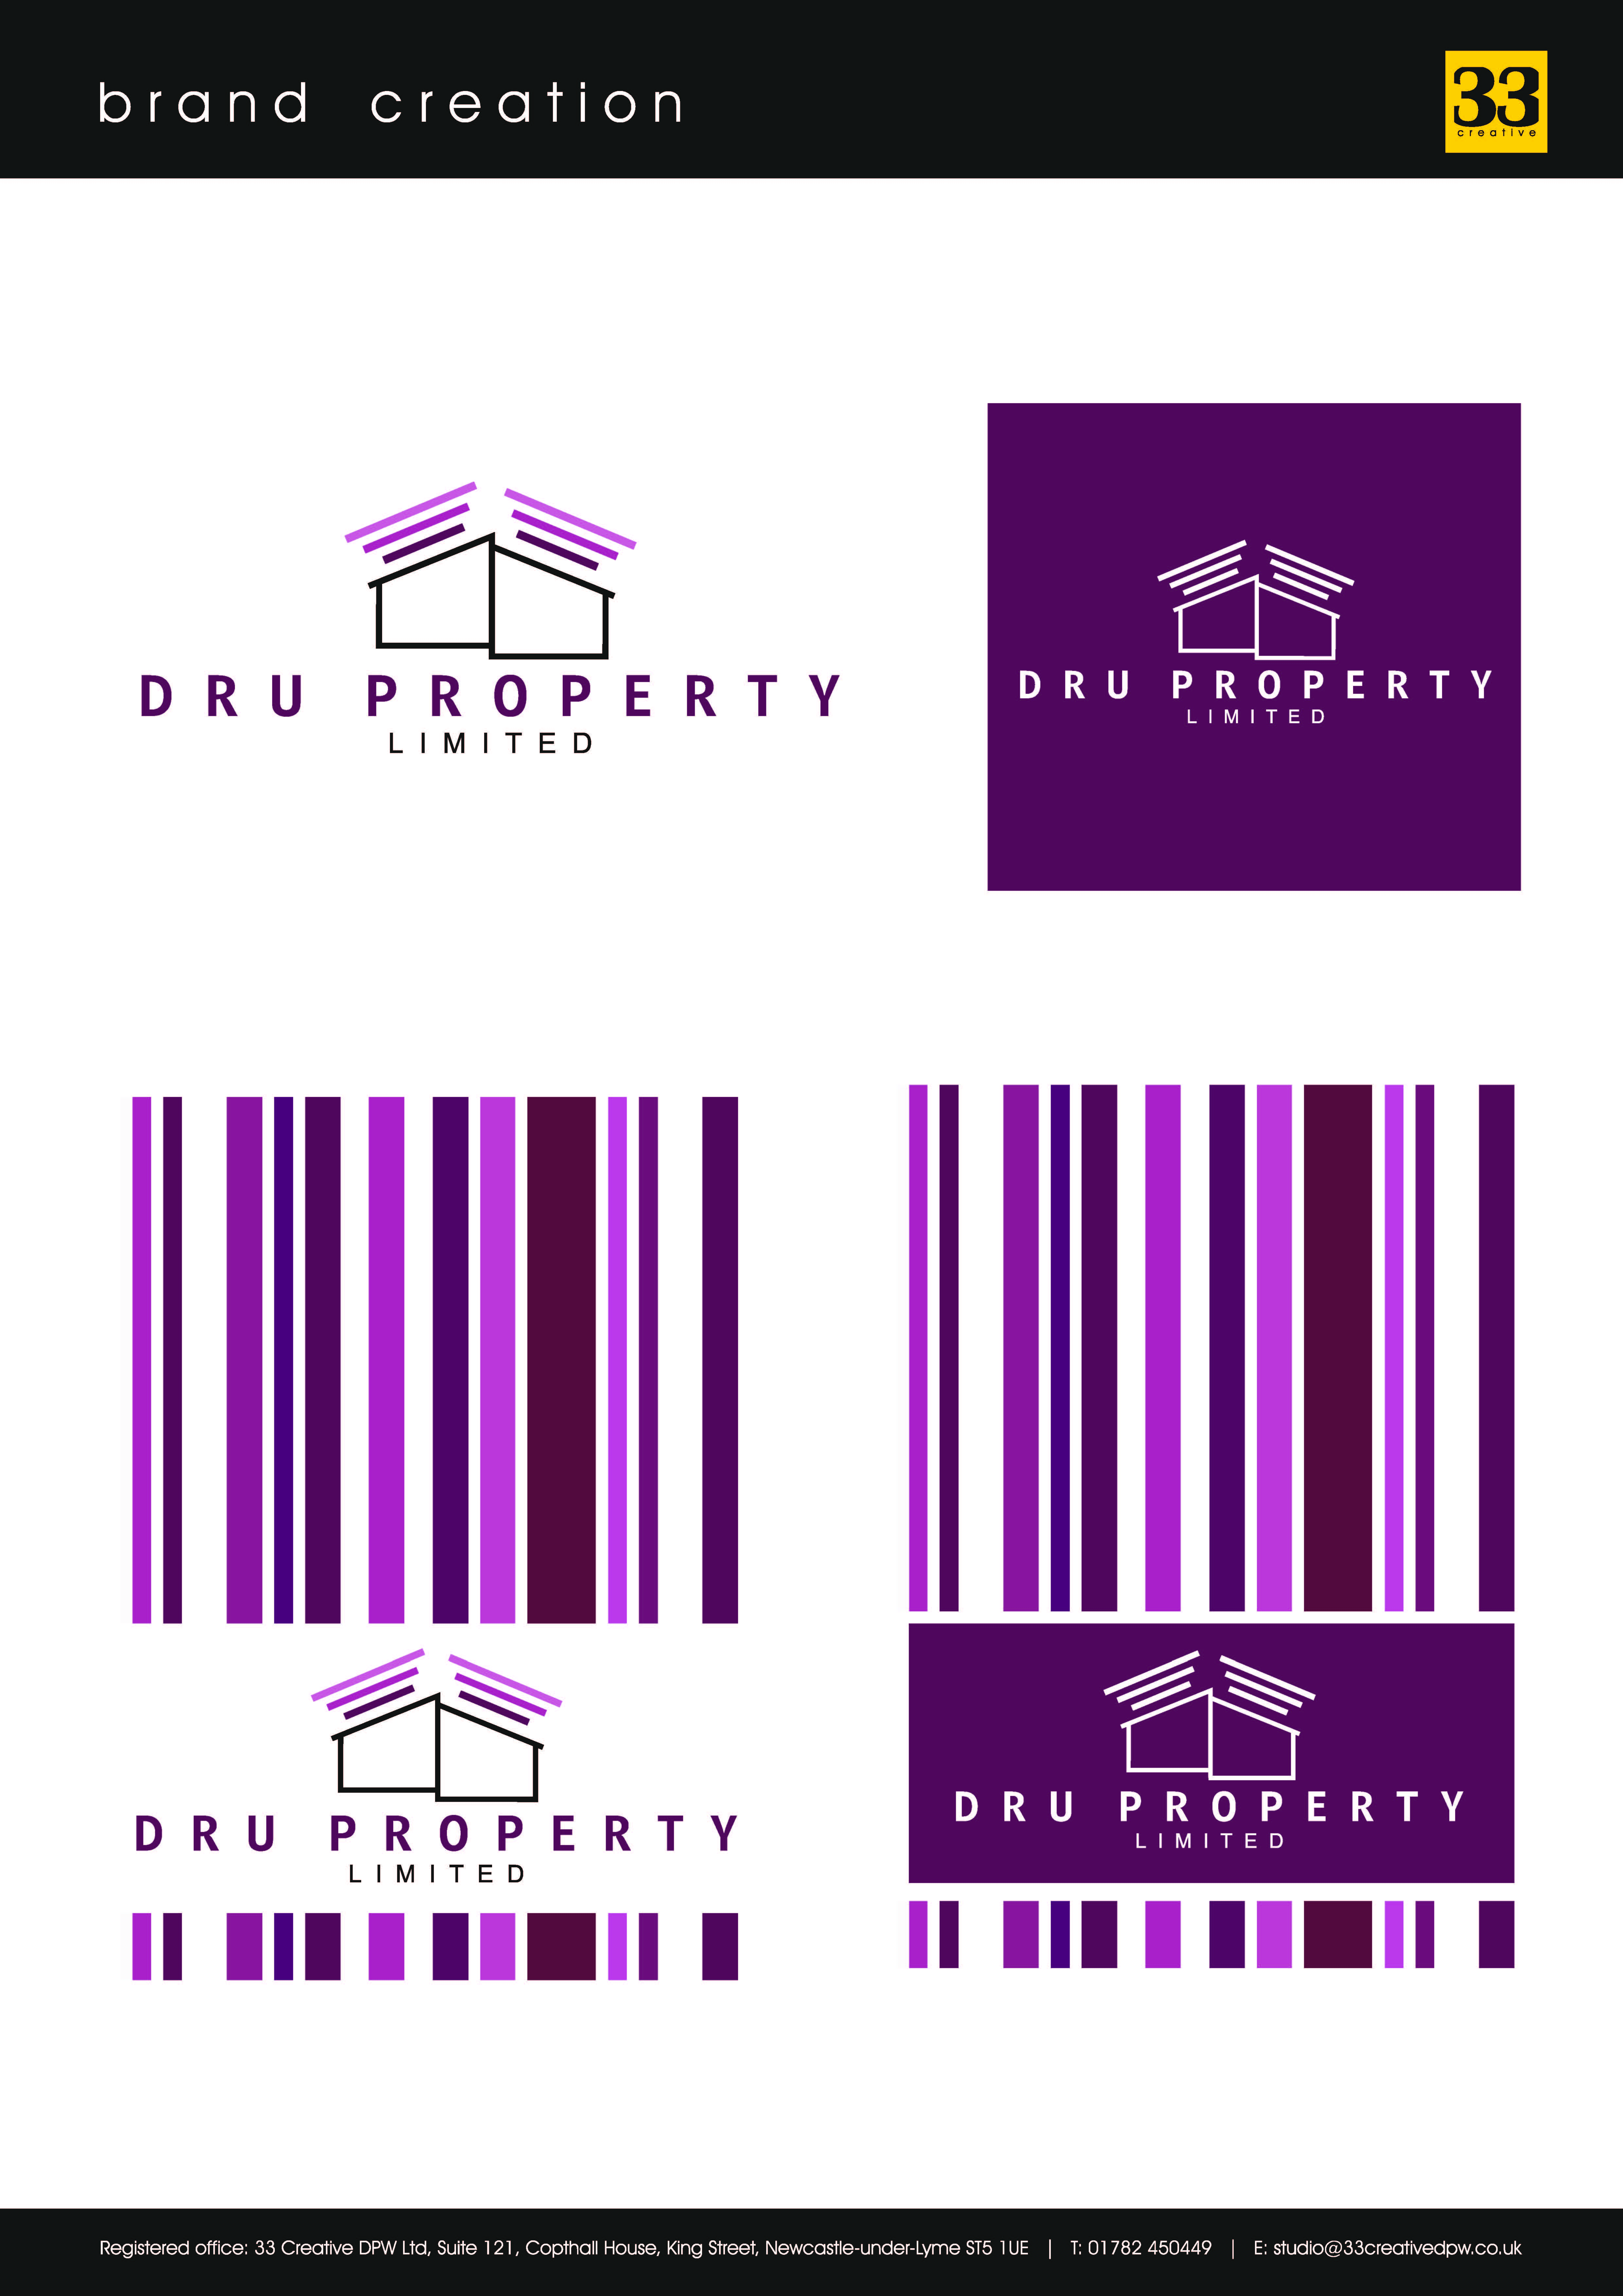 Dru Property Brand Creation_Page_2